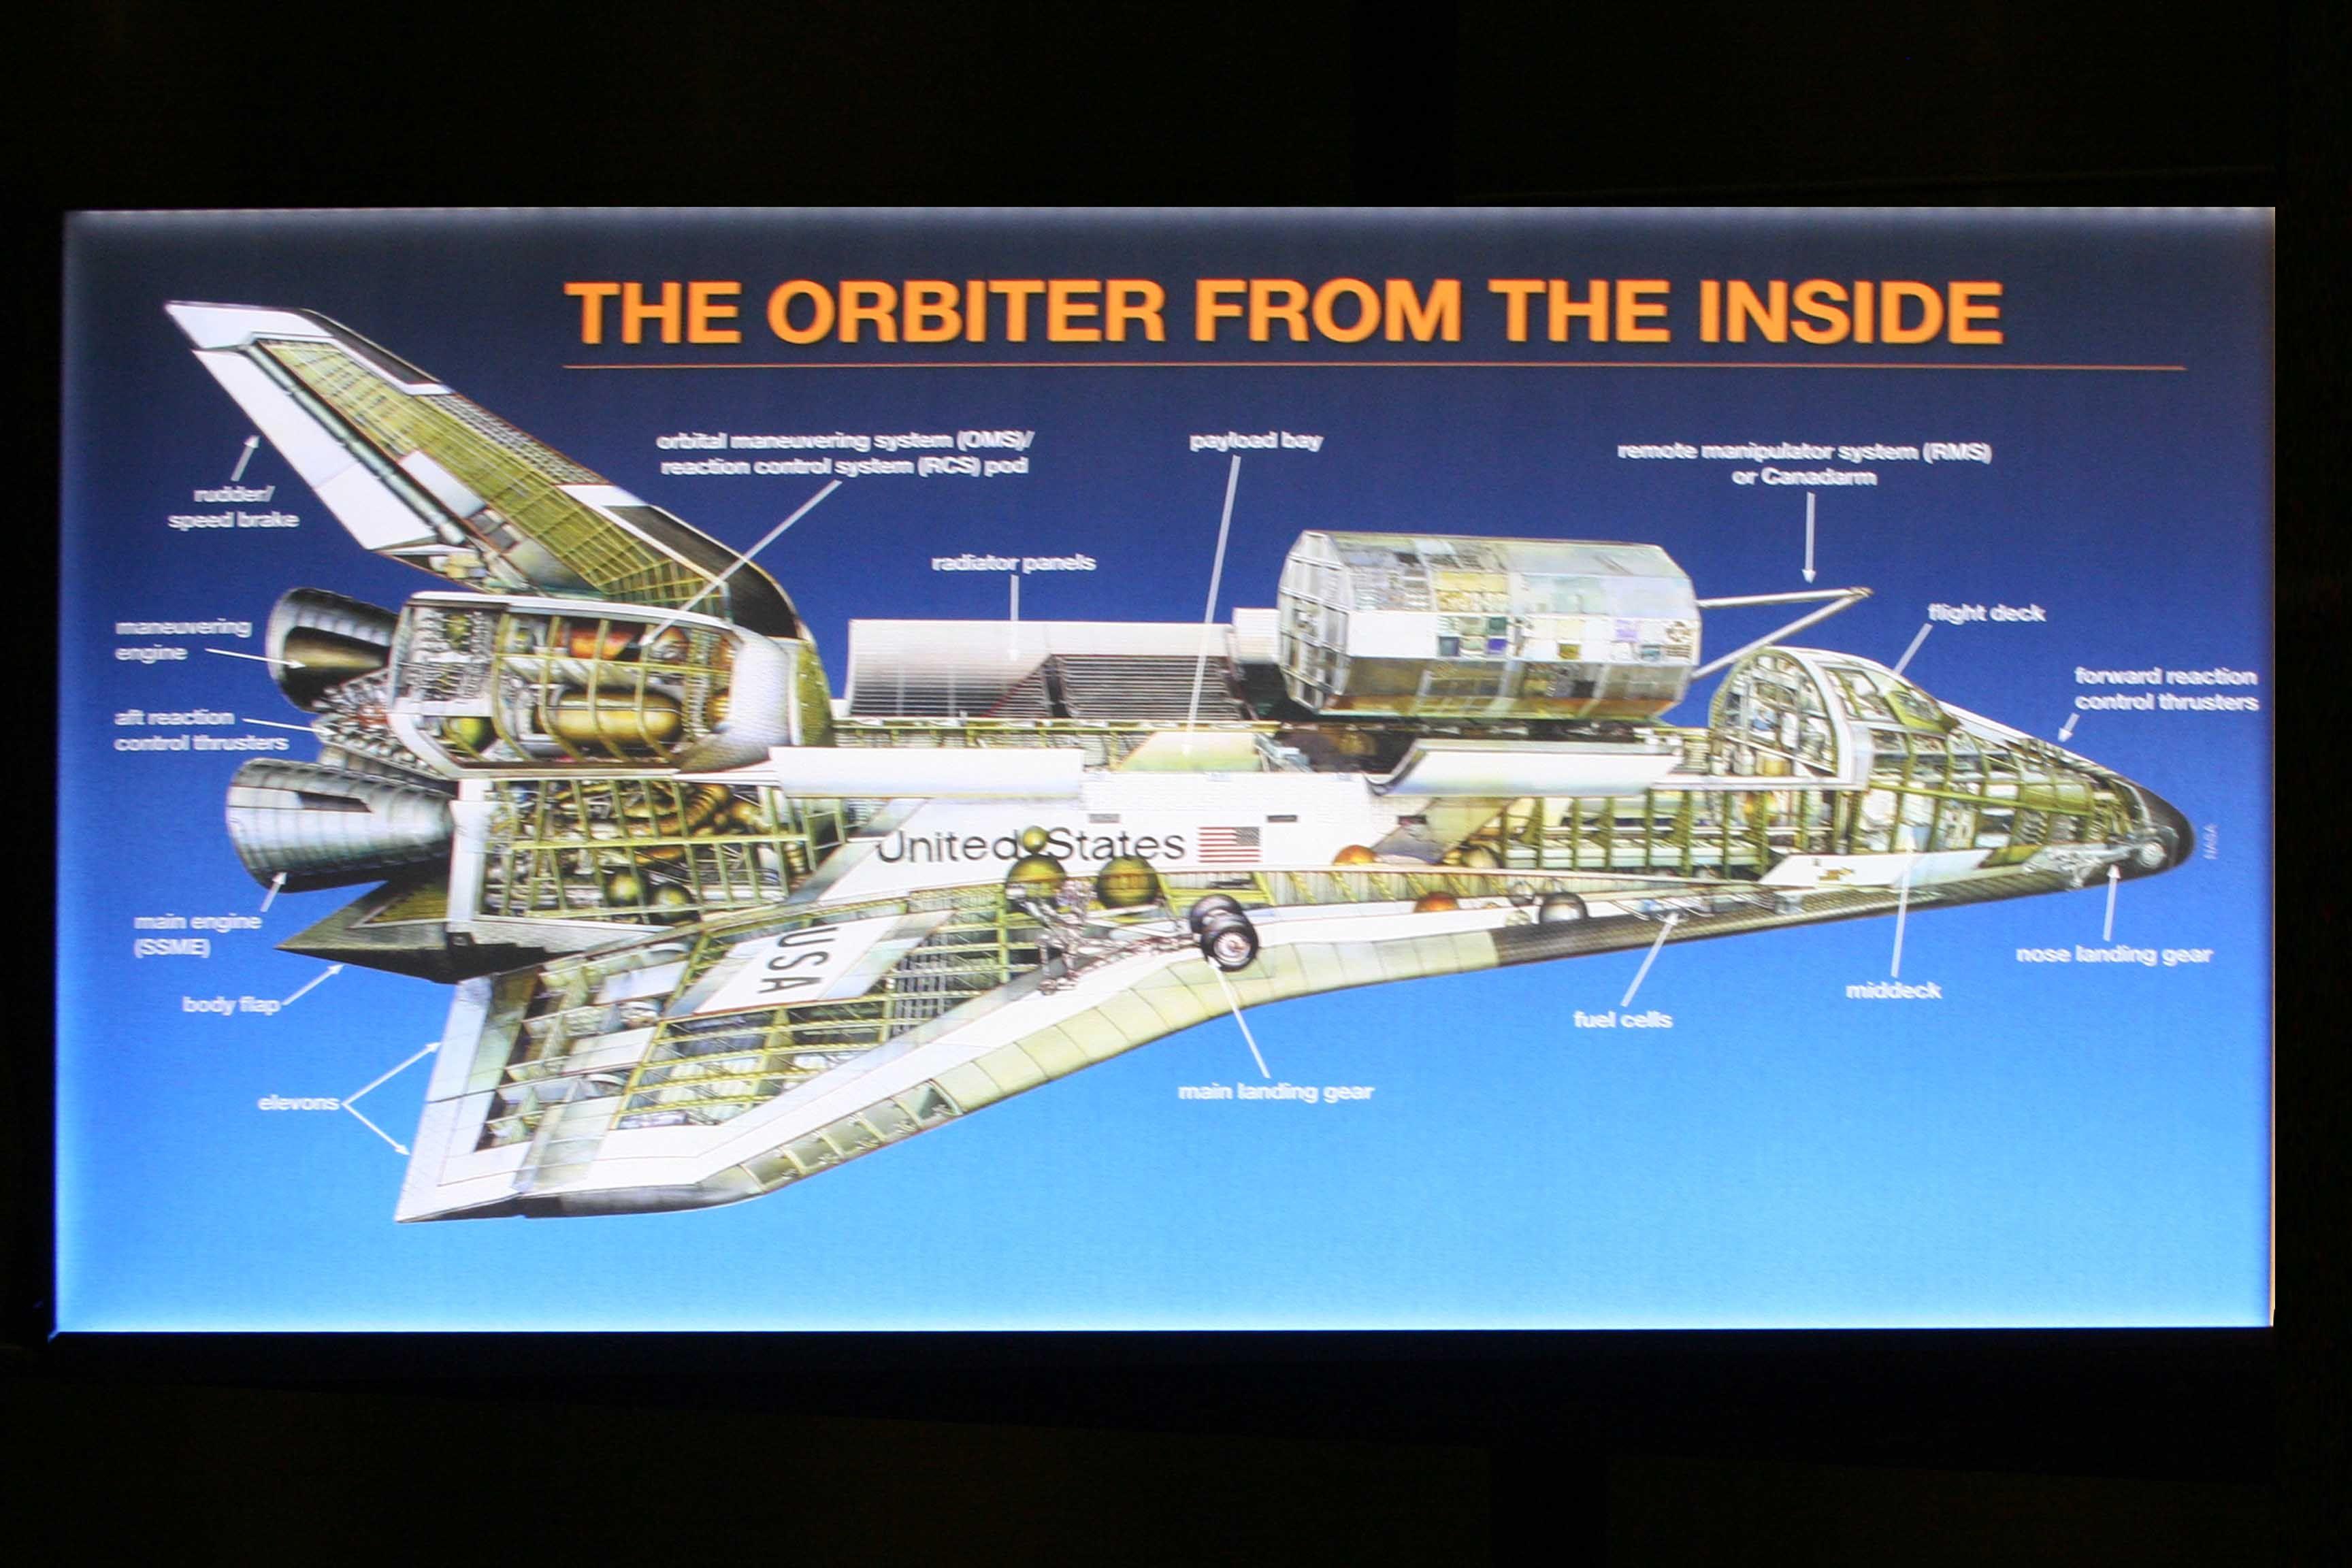 international space station block diagram - photo #47